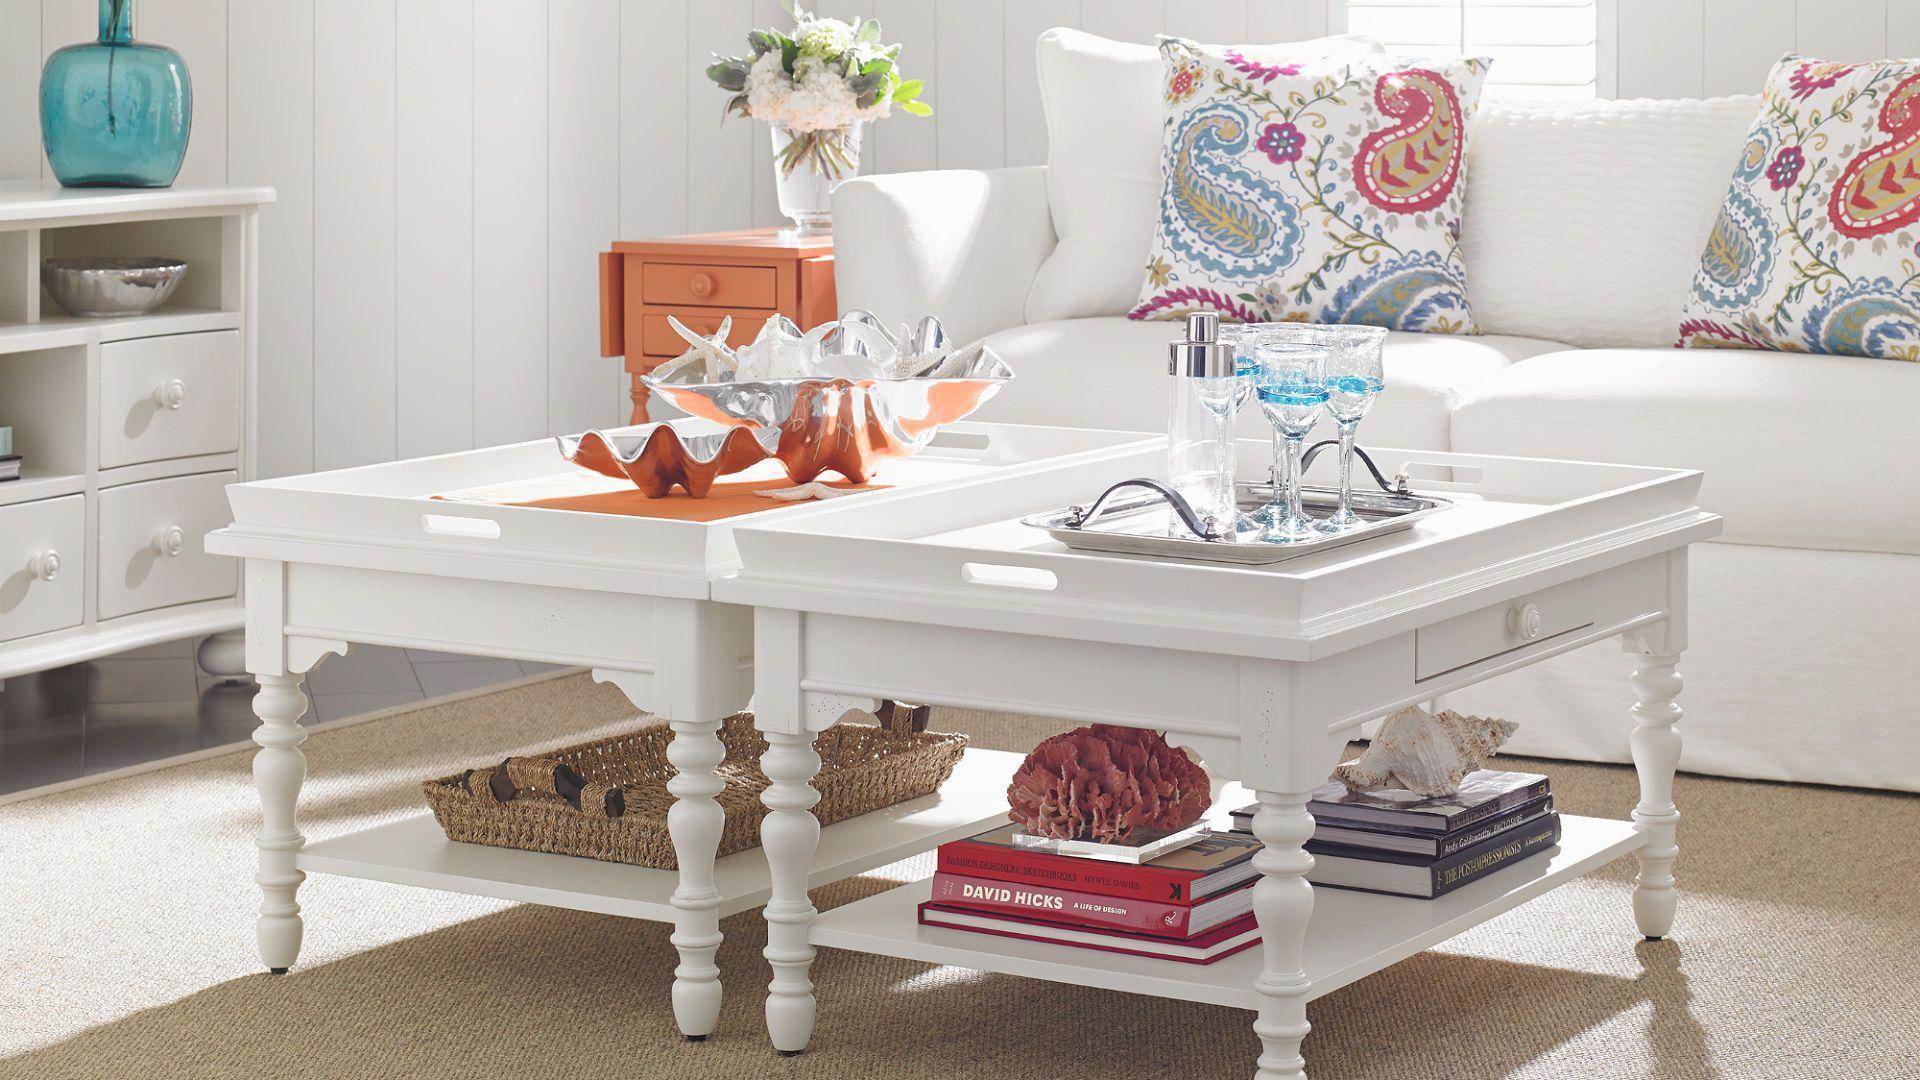 light bright living stanley furniture company. Black Bedroom Furniture Sets. Home Design Ideas